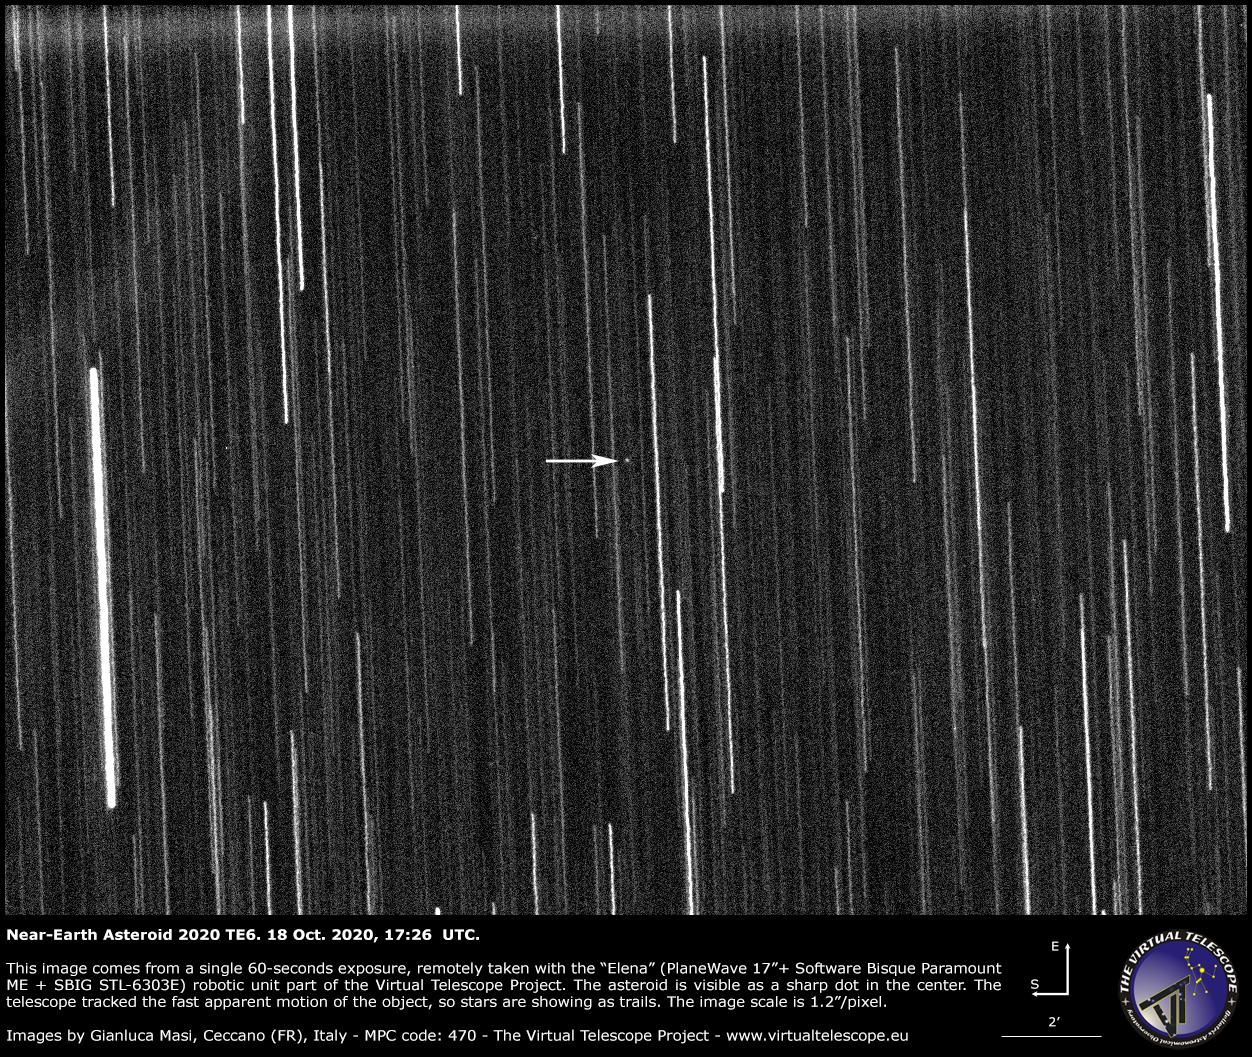 Near-Earth asteroid 2020 TE6. 18 Oct. 2020.